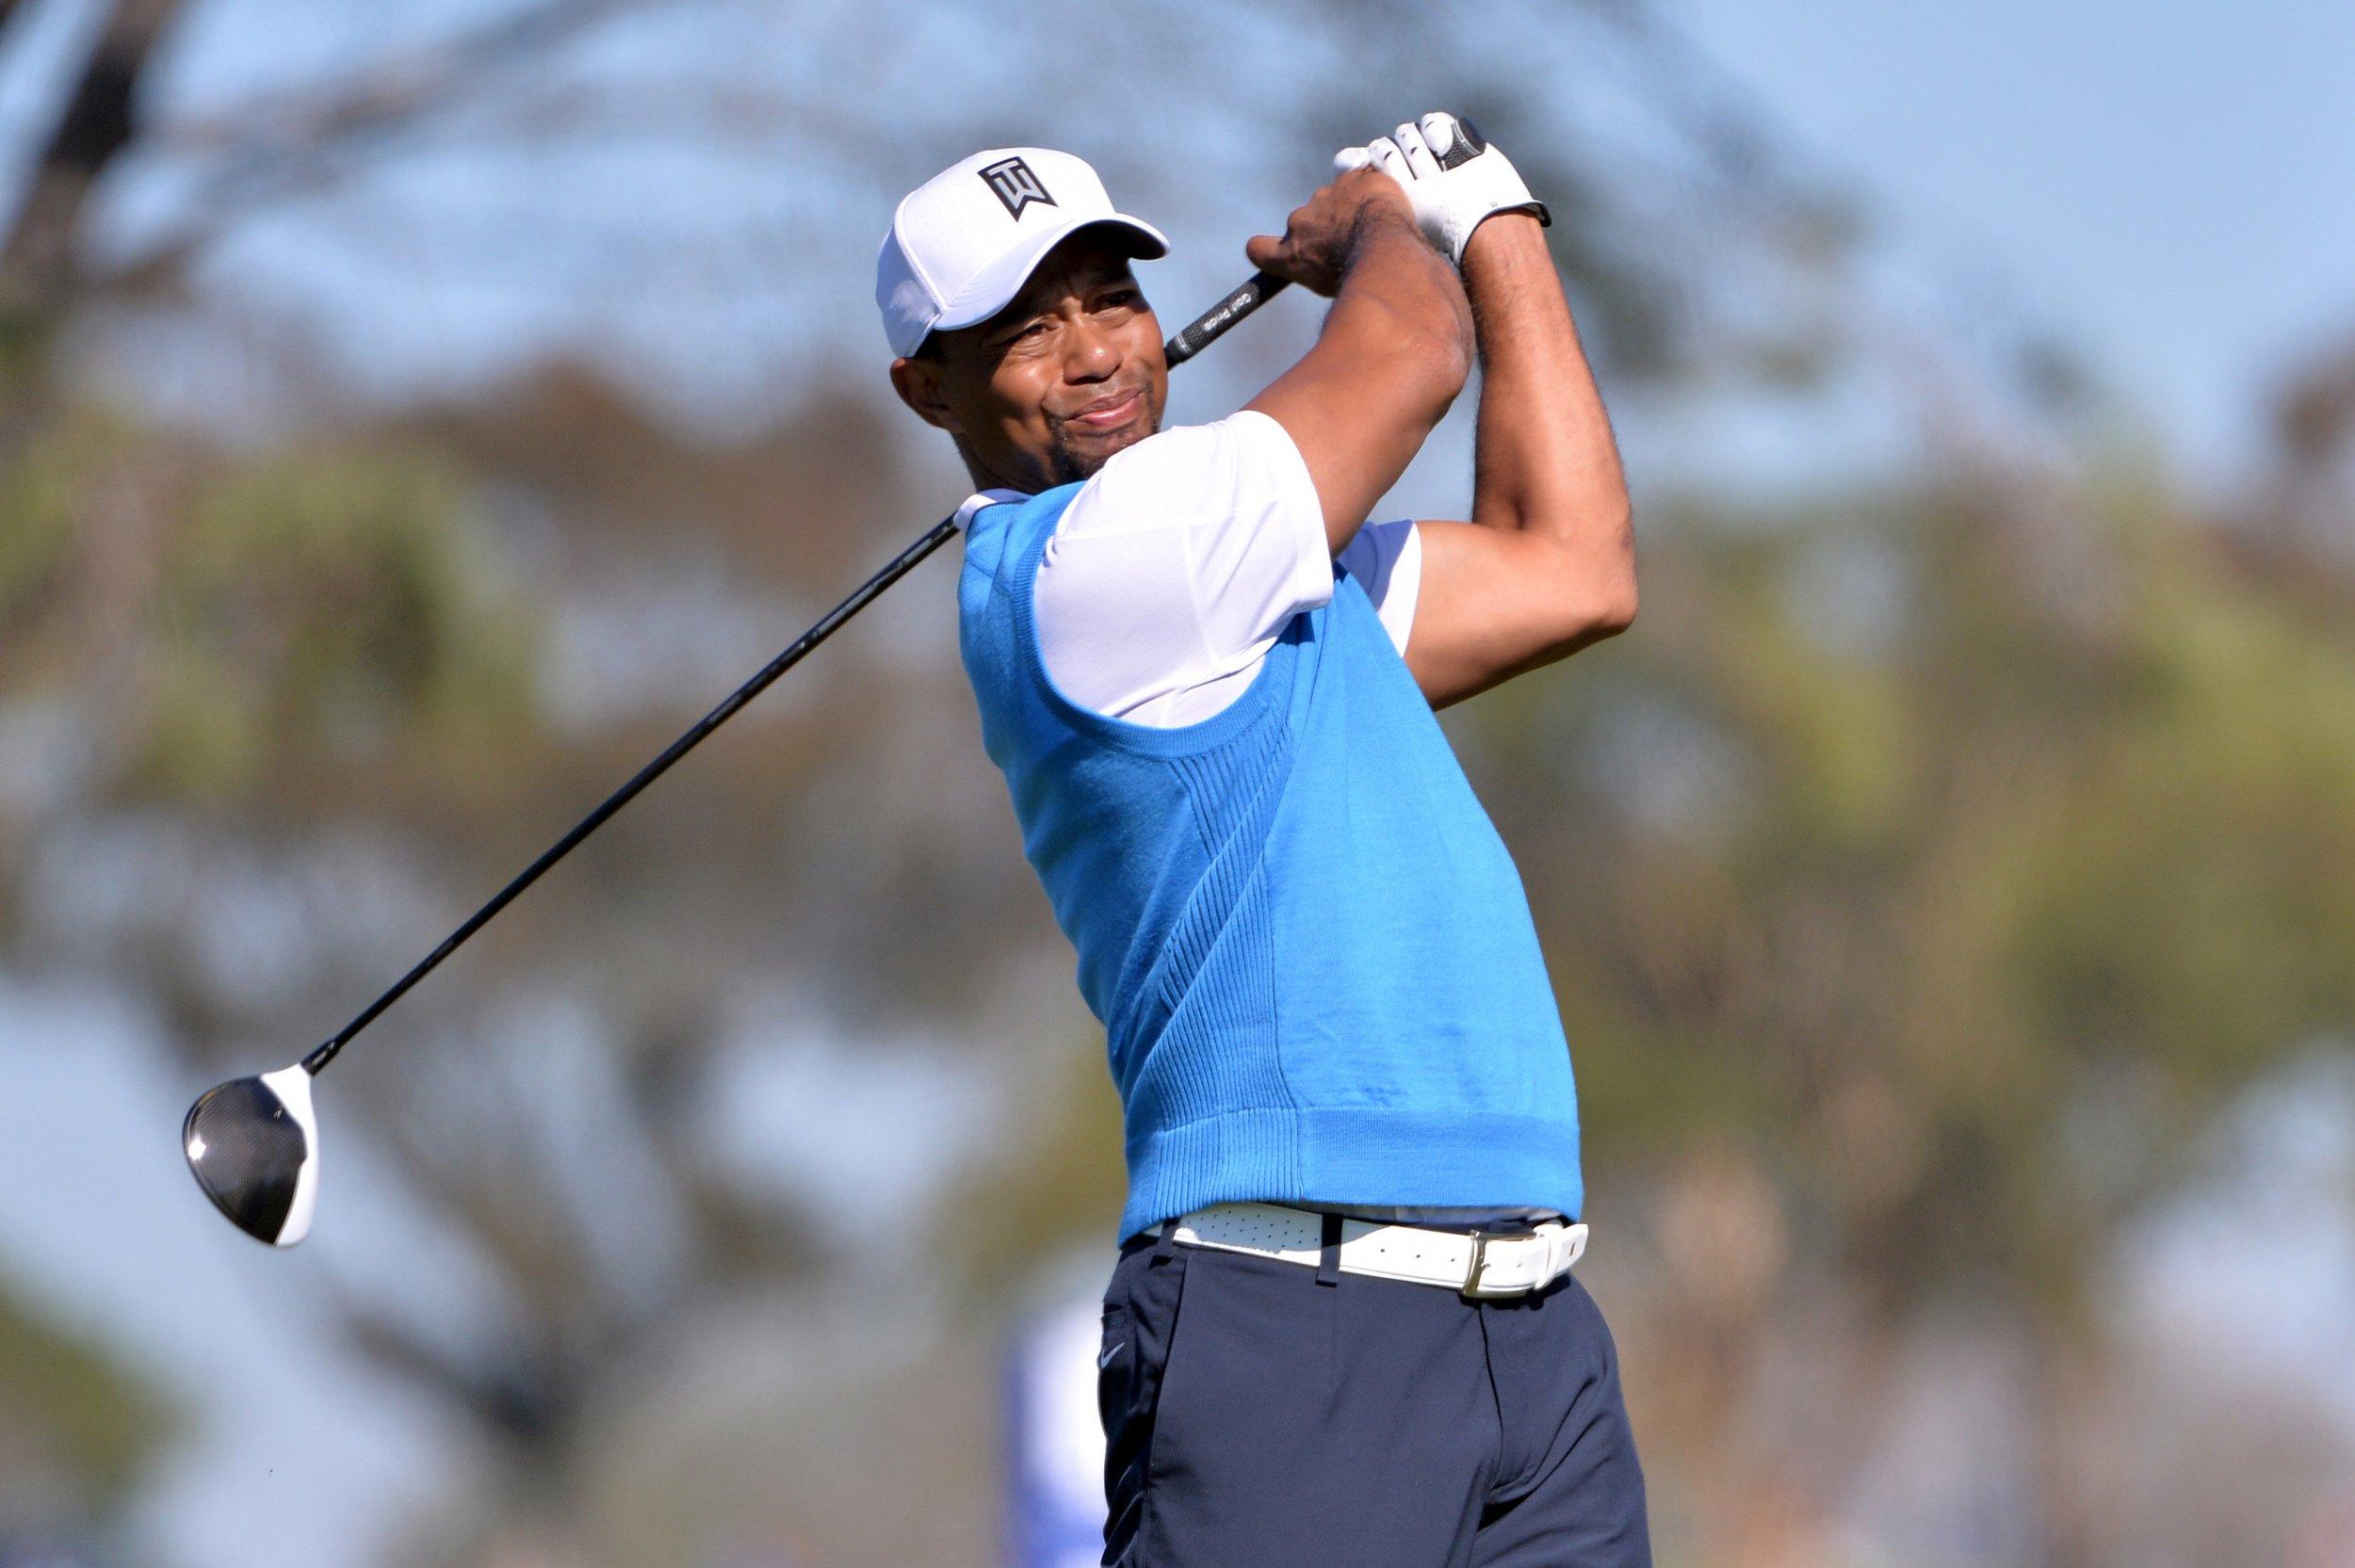 tiger woods  golfer apologizes for dui arrest  blames